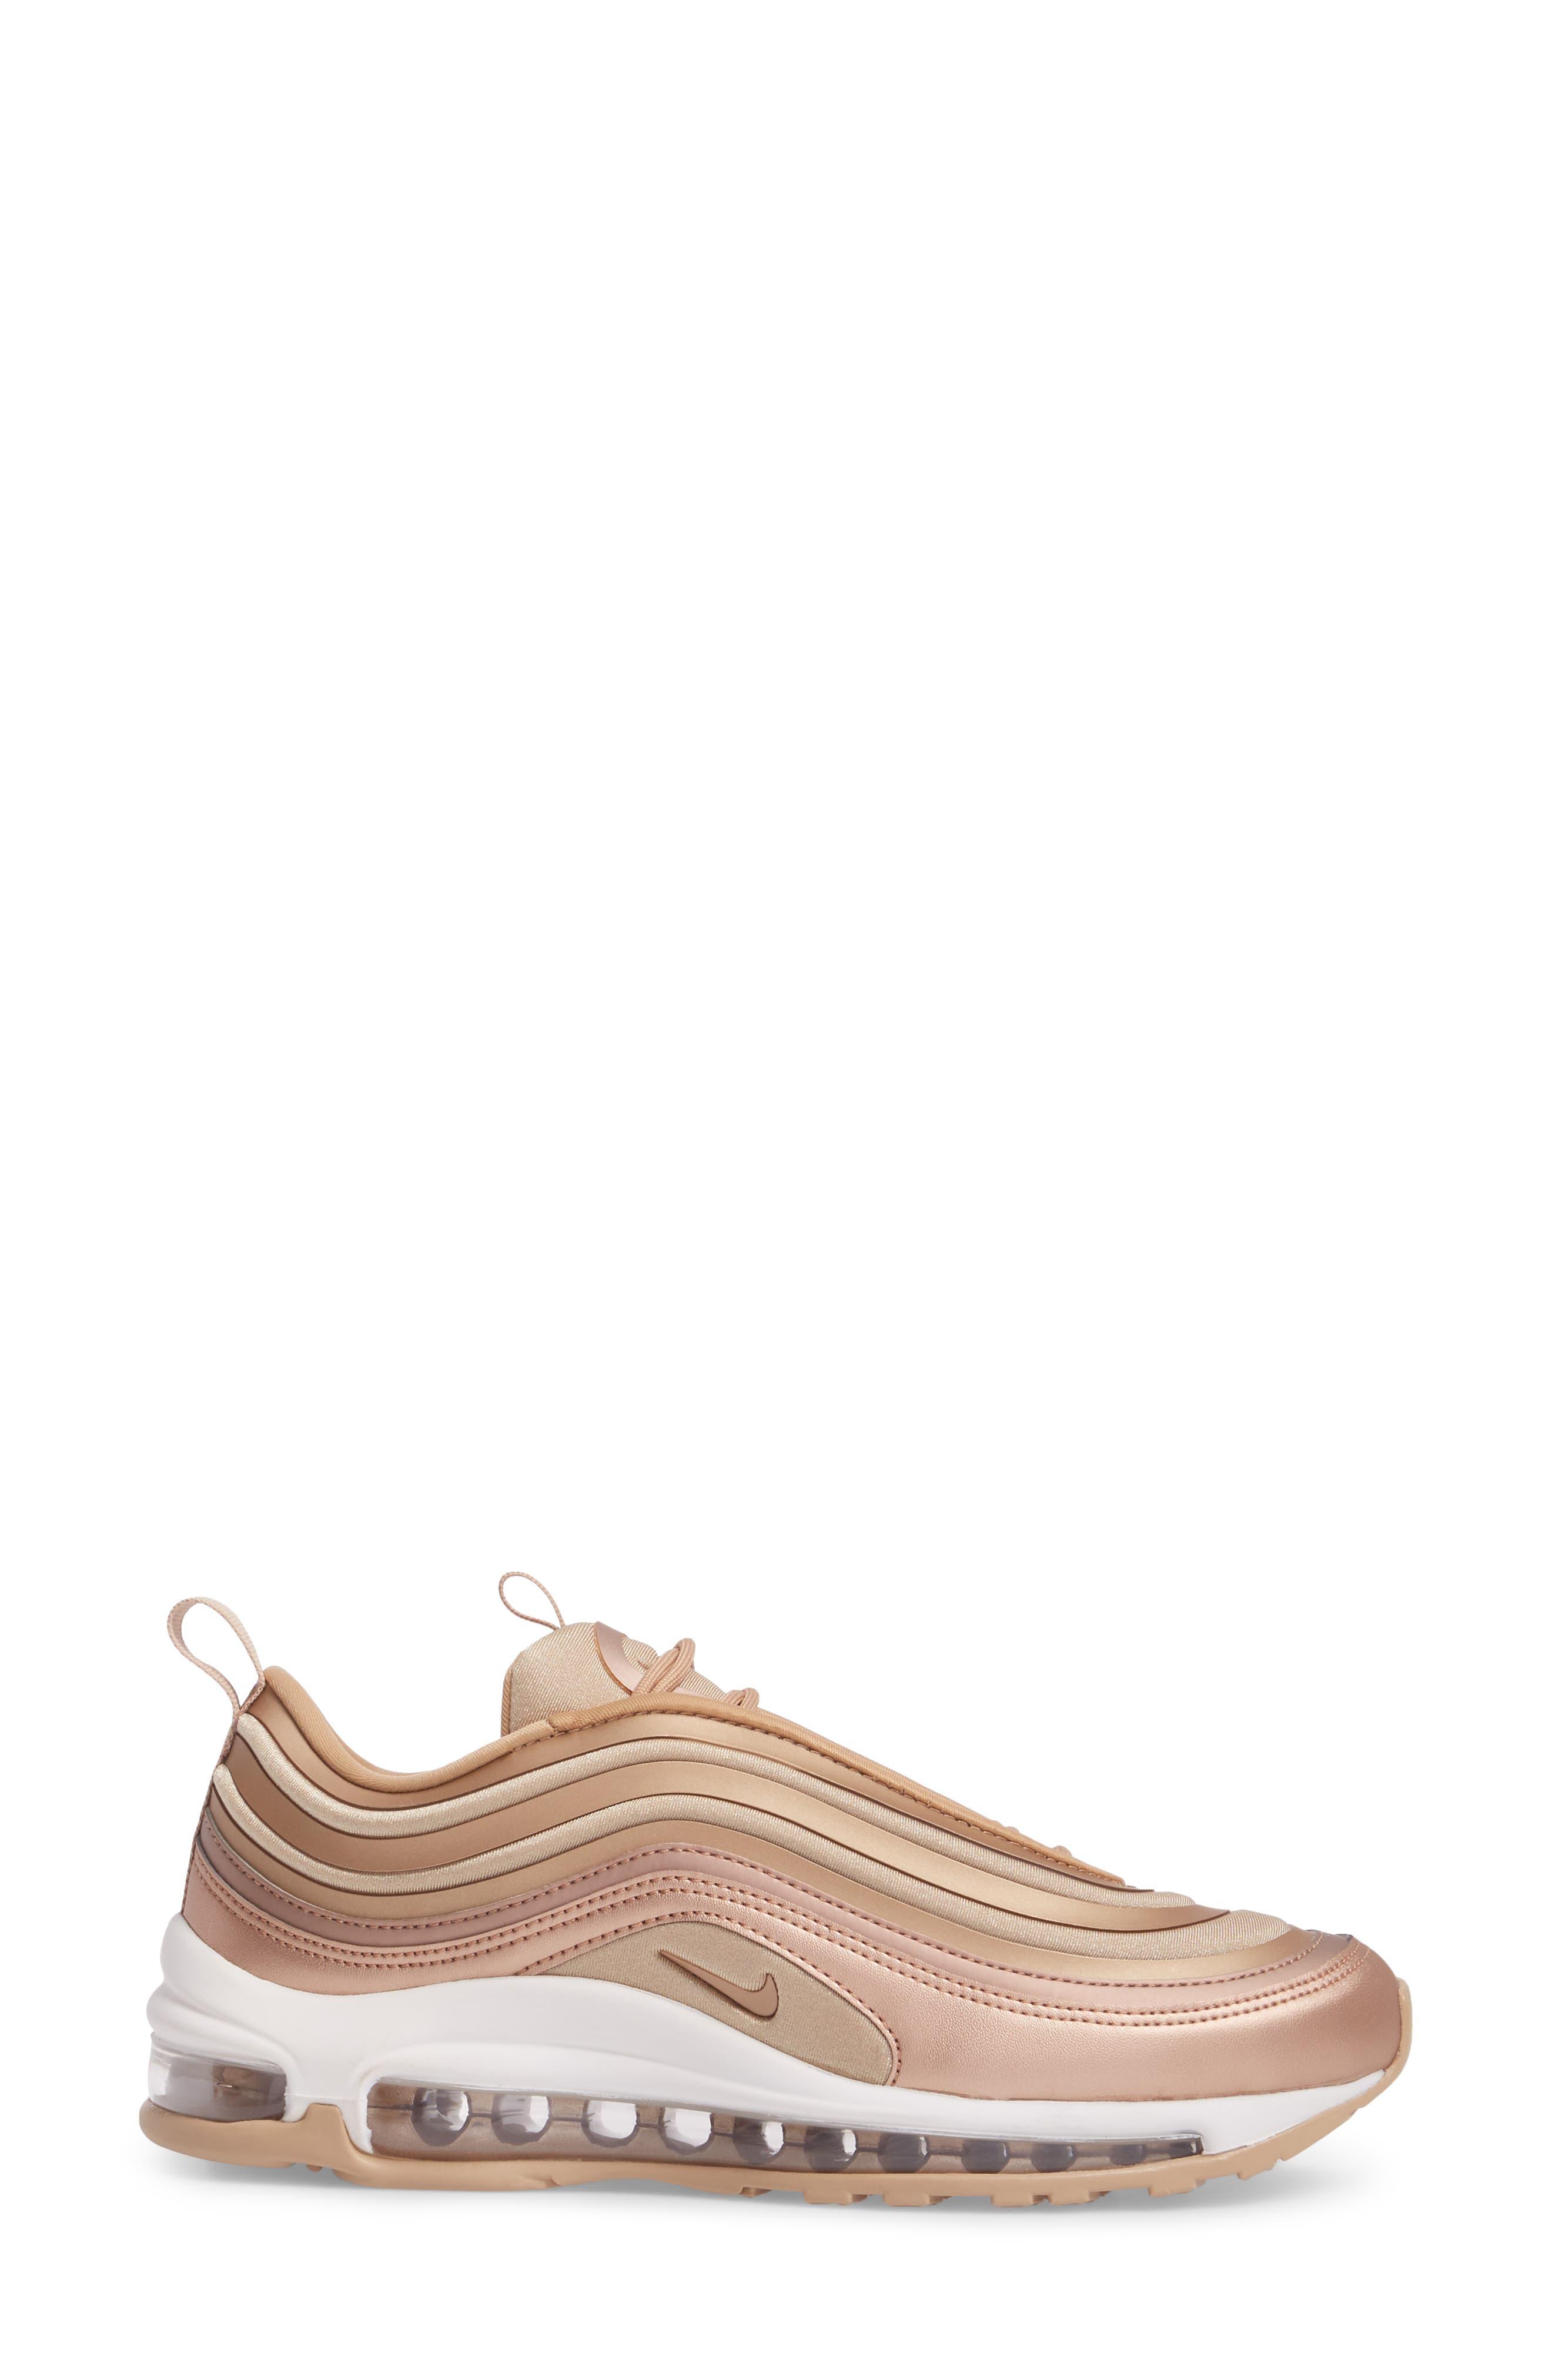 Air Max 97 Ultralight 2017 Sneaker,                             Alternate thumbnail 30, color,